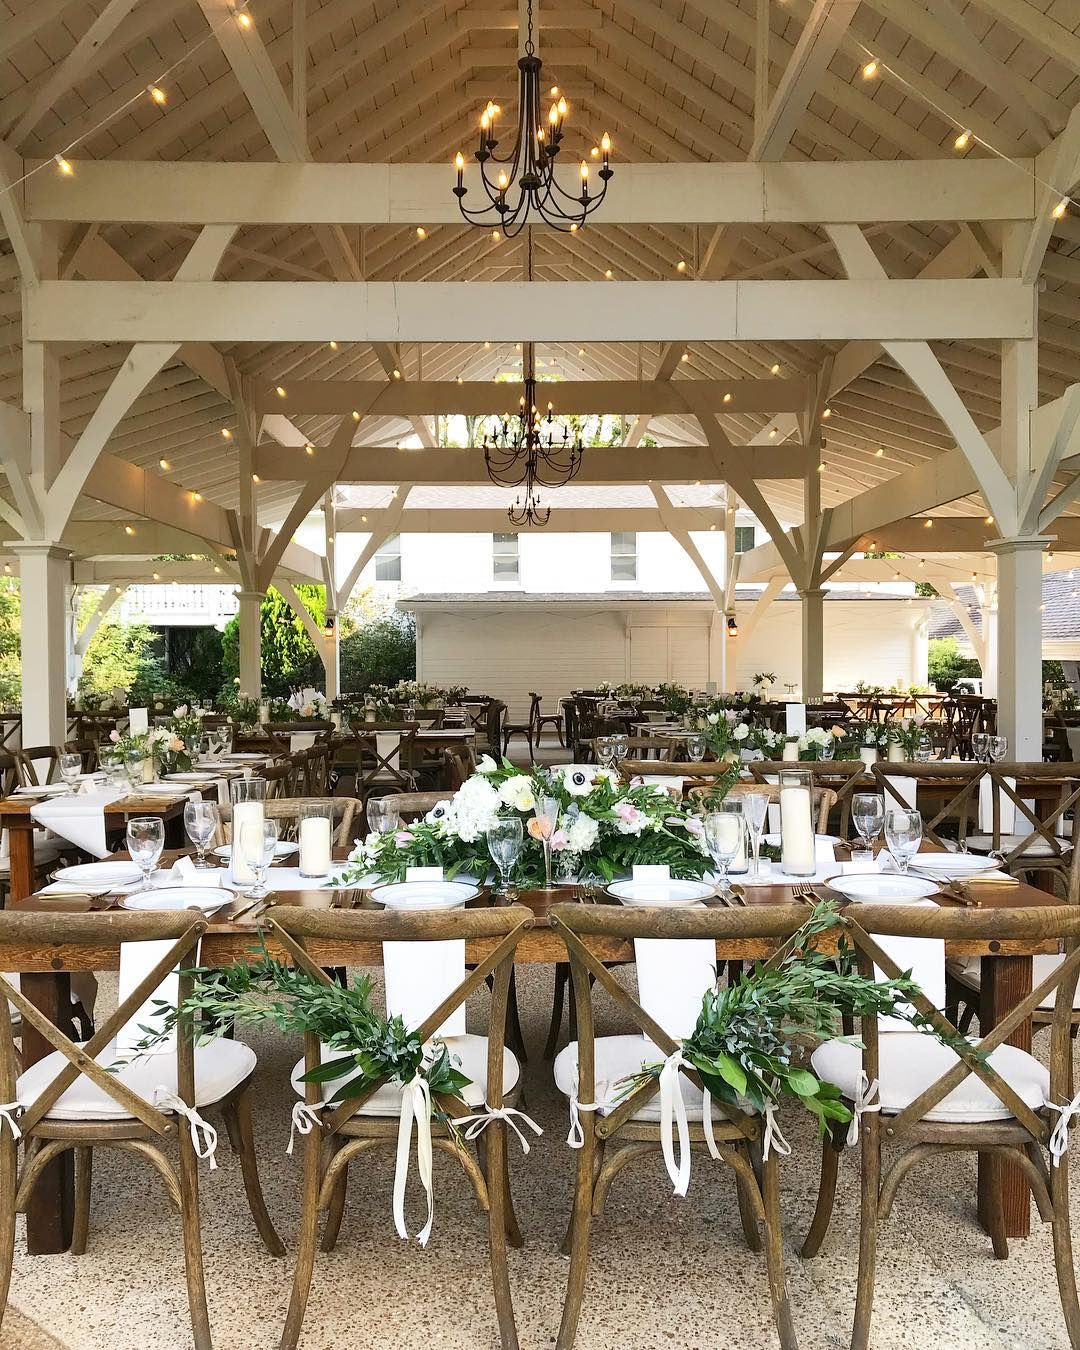 206 Likes 6 Comments Cedarwood Weddings Cedarwoodweddings On Instagram It S Time To Celebrate Caroline A Time To Celebrate Cedarwood Table Decorations